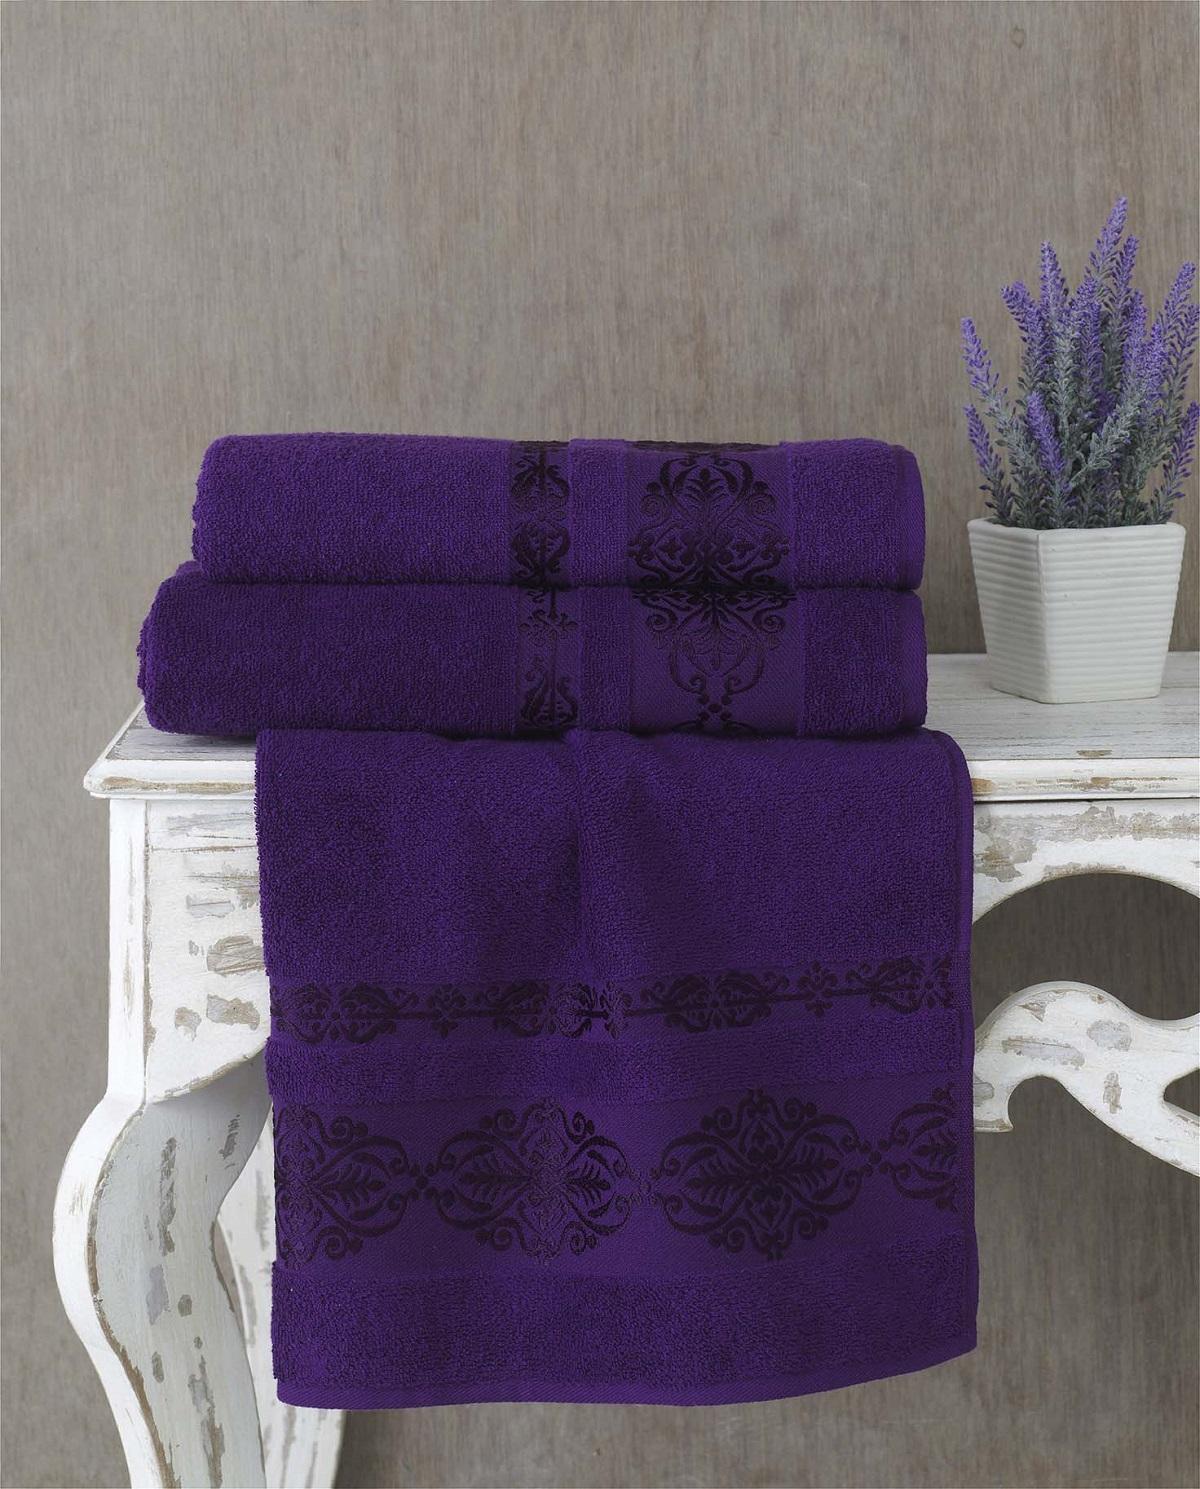 Полотенца Karna Полотенце Rebeka Цвет: Фиолетовый (70х140 см) полотенца karna полотенце iteka цвет коричневый 70х140 см